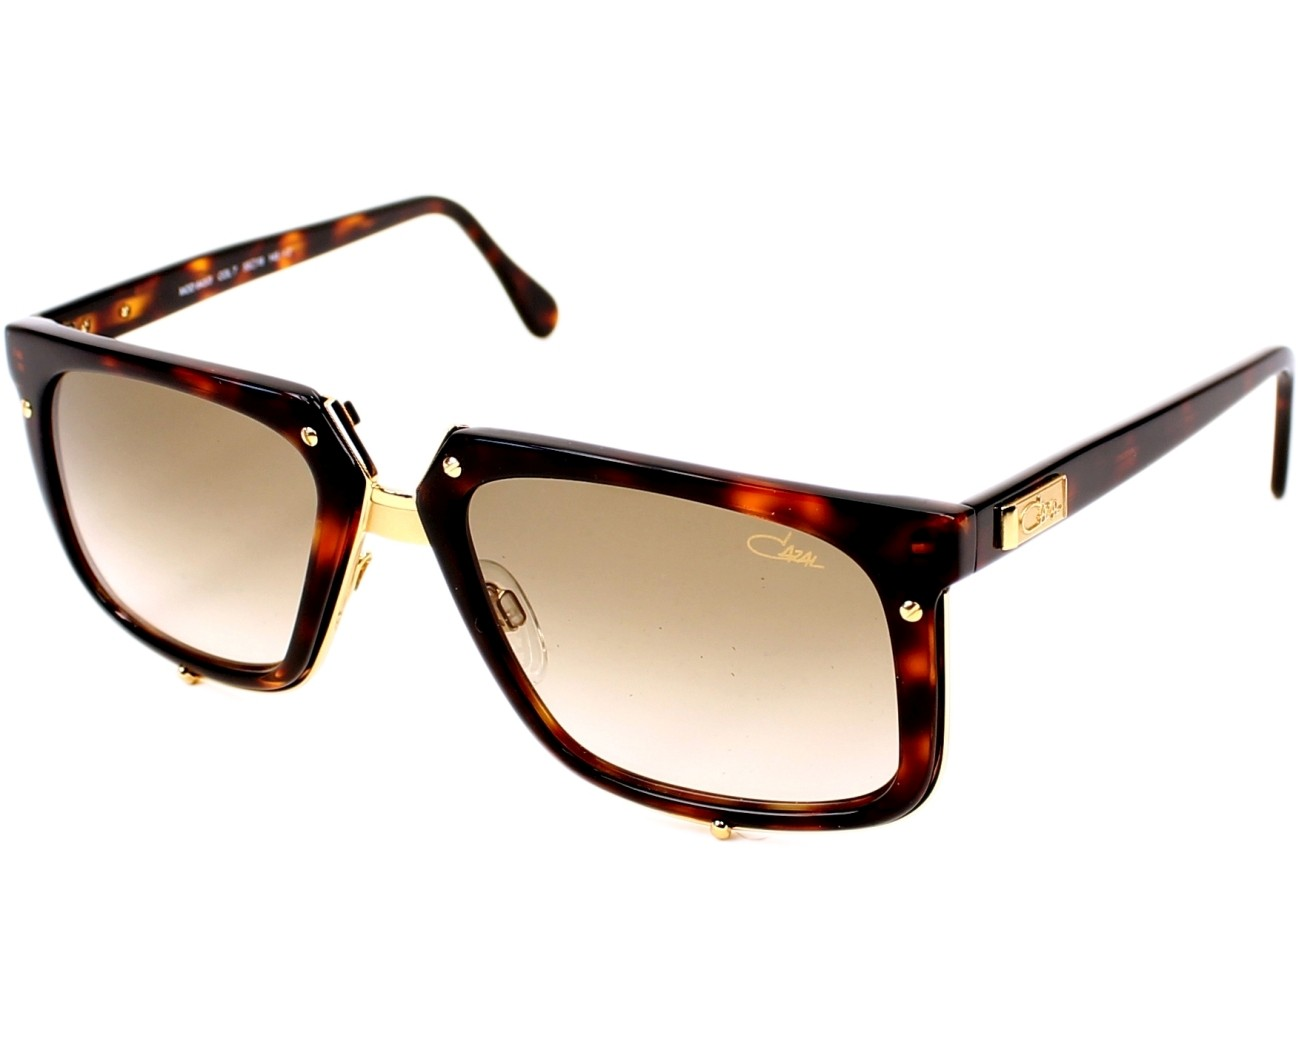 Cazal Sunglasses 643 3 007 Havana Visio Net Com